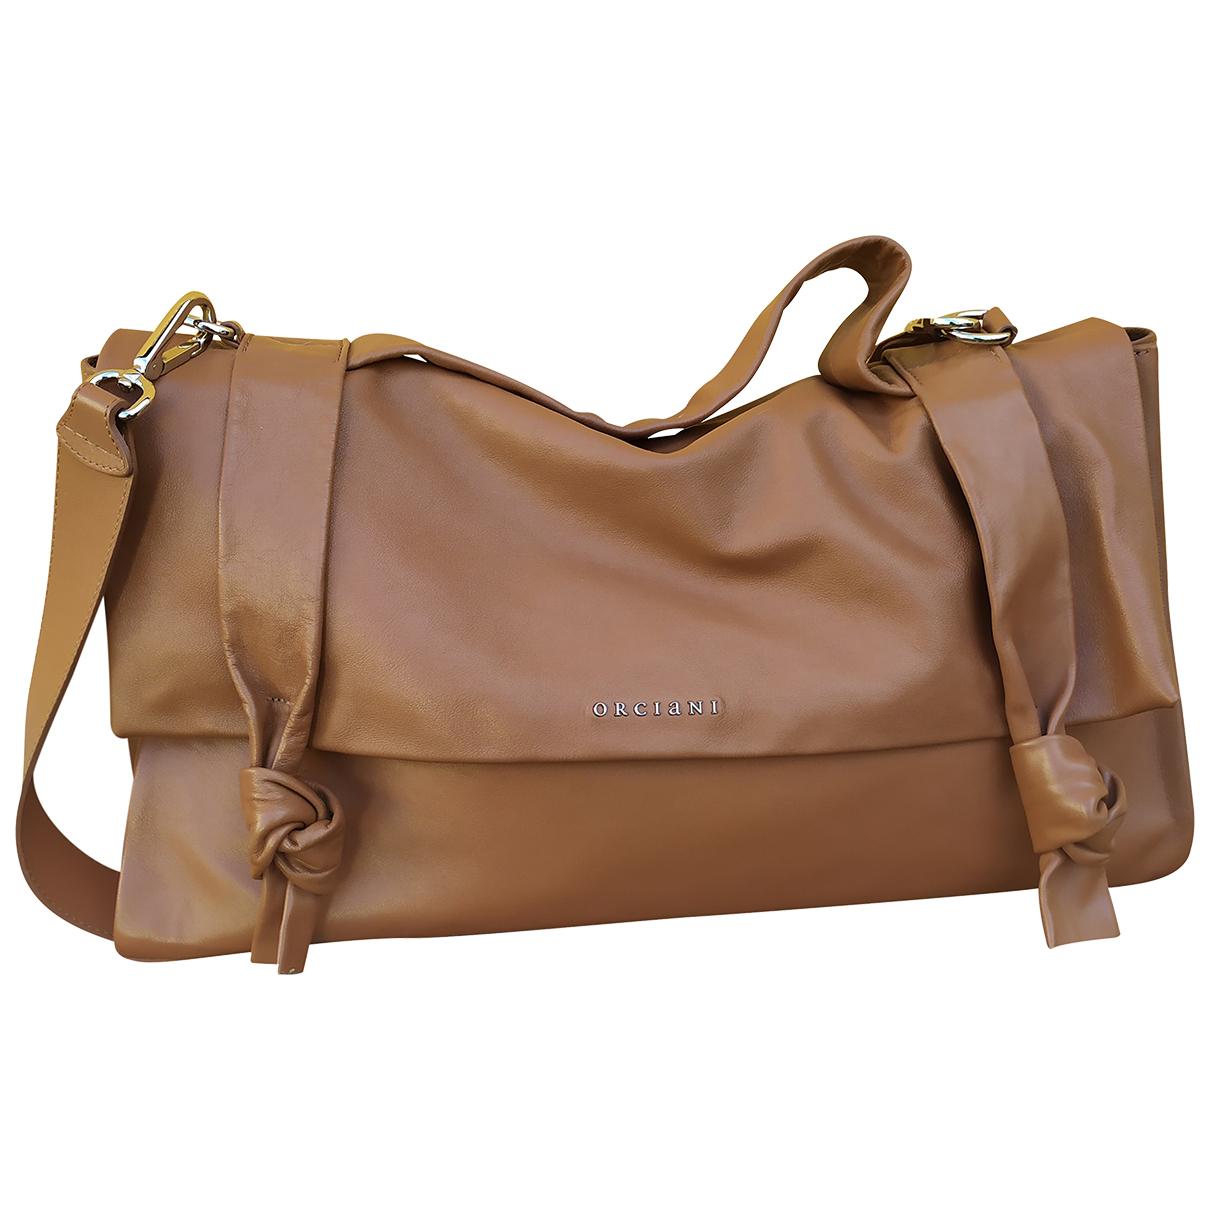 Orciani N Camel Leather handbag for Women N